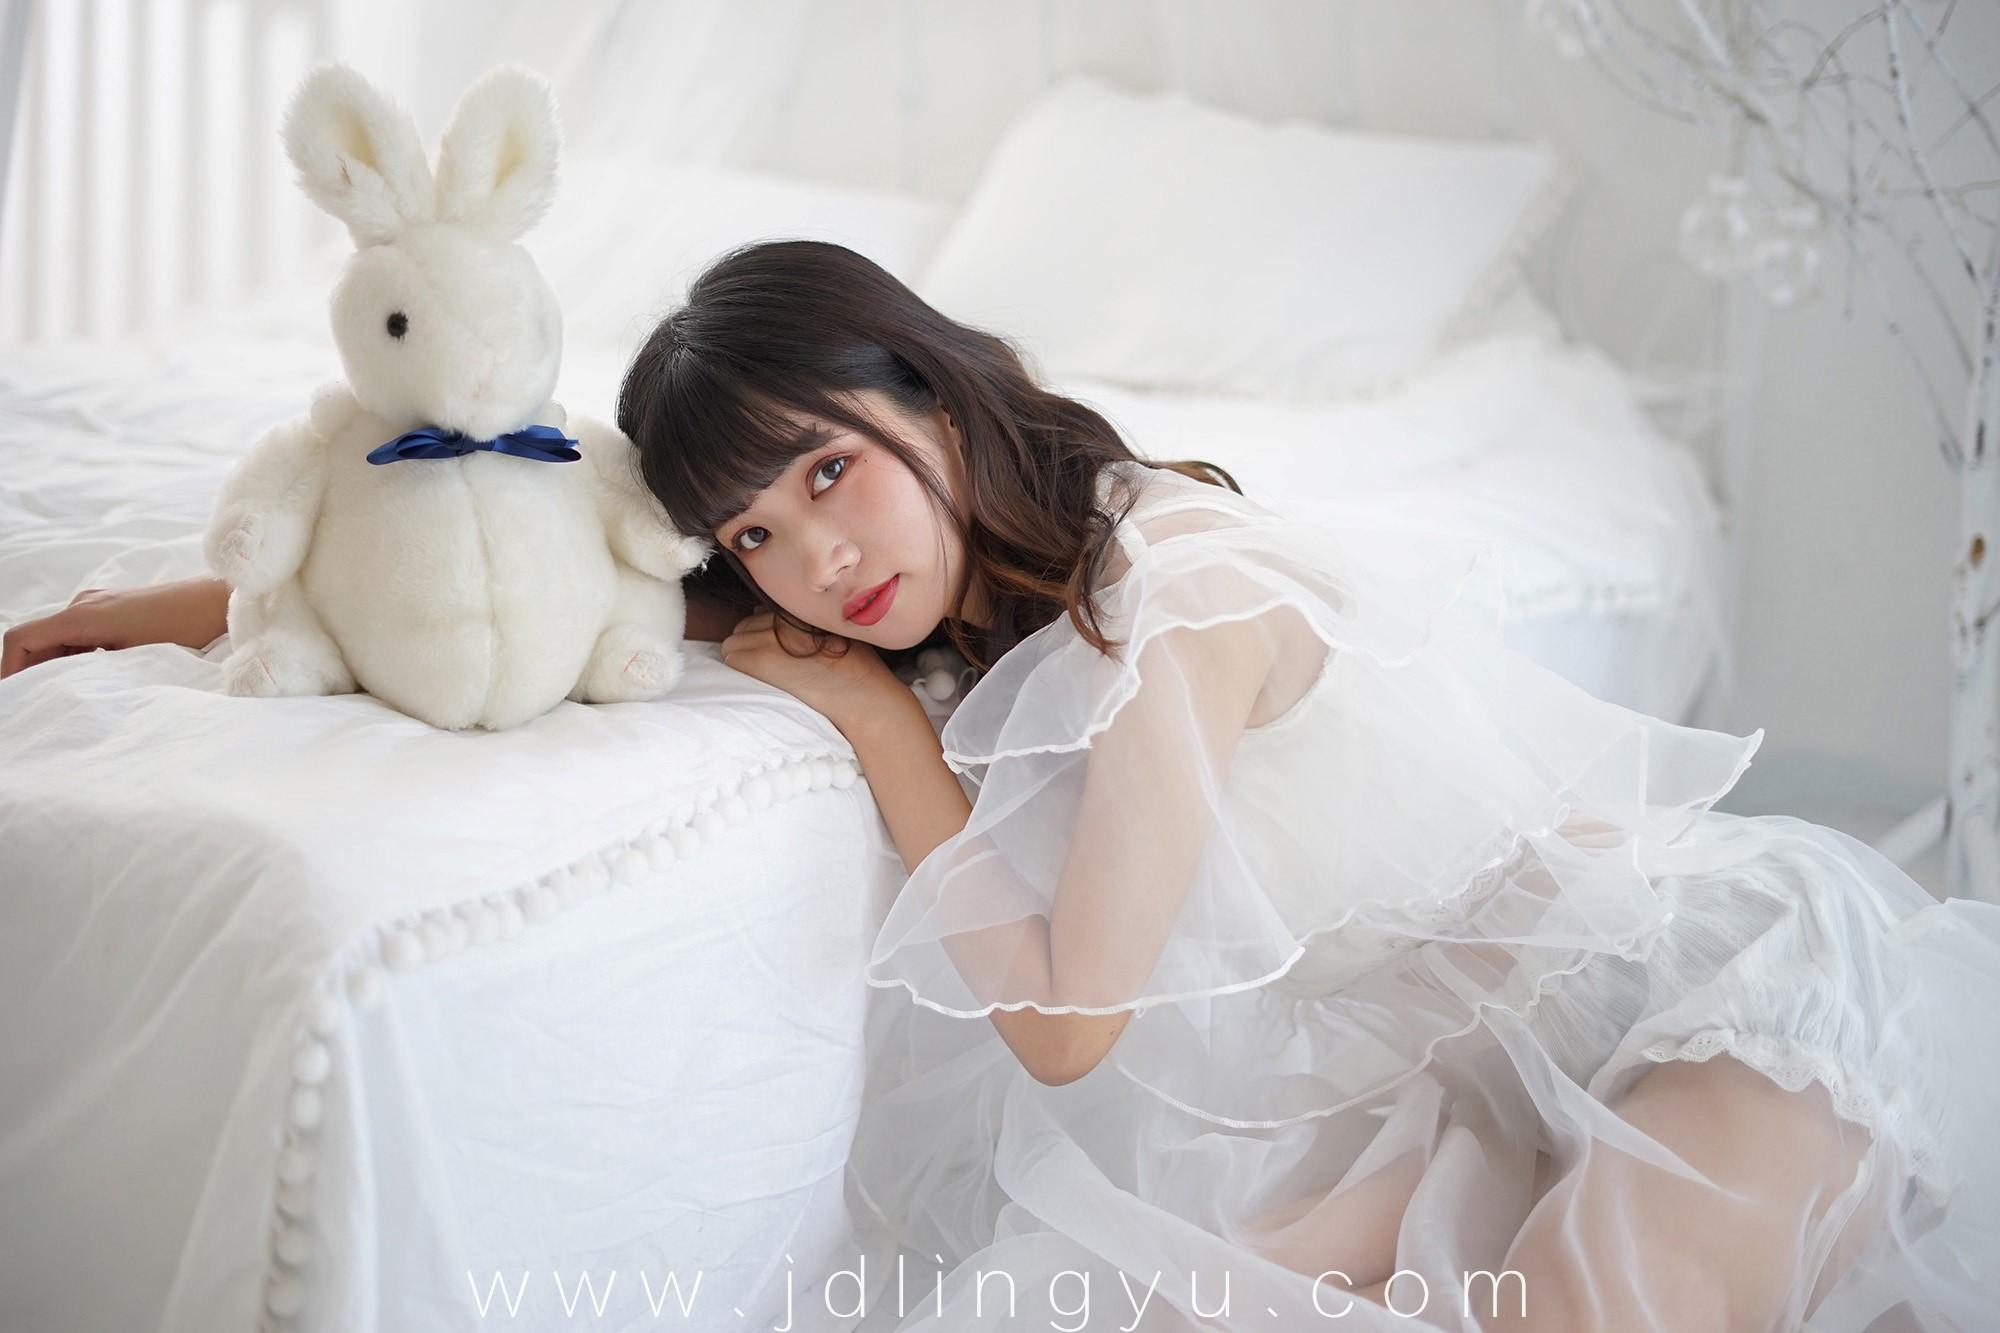 [YaLaYi]雅拉伊 2018.05.25 No.0001 公主小兔子 恋上你的床